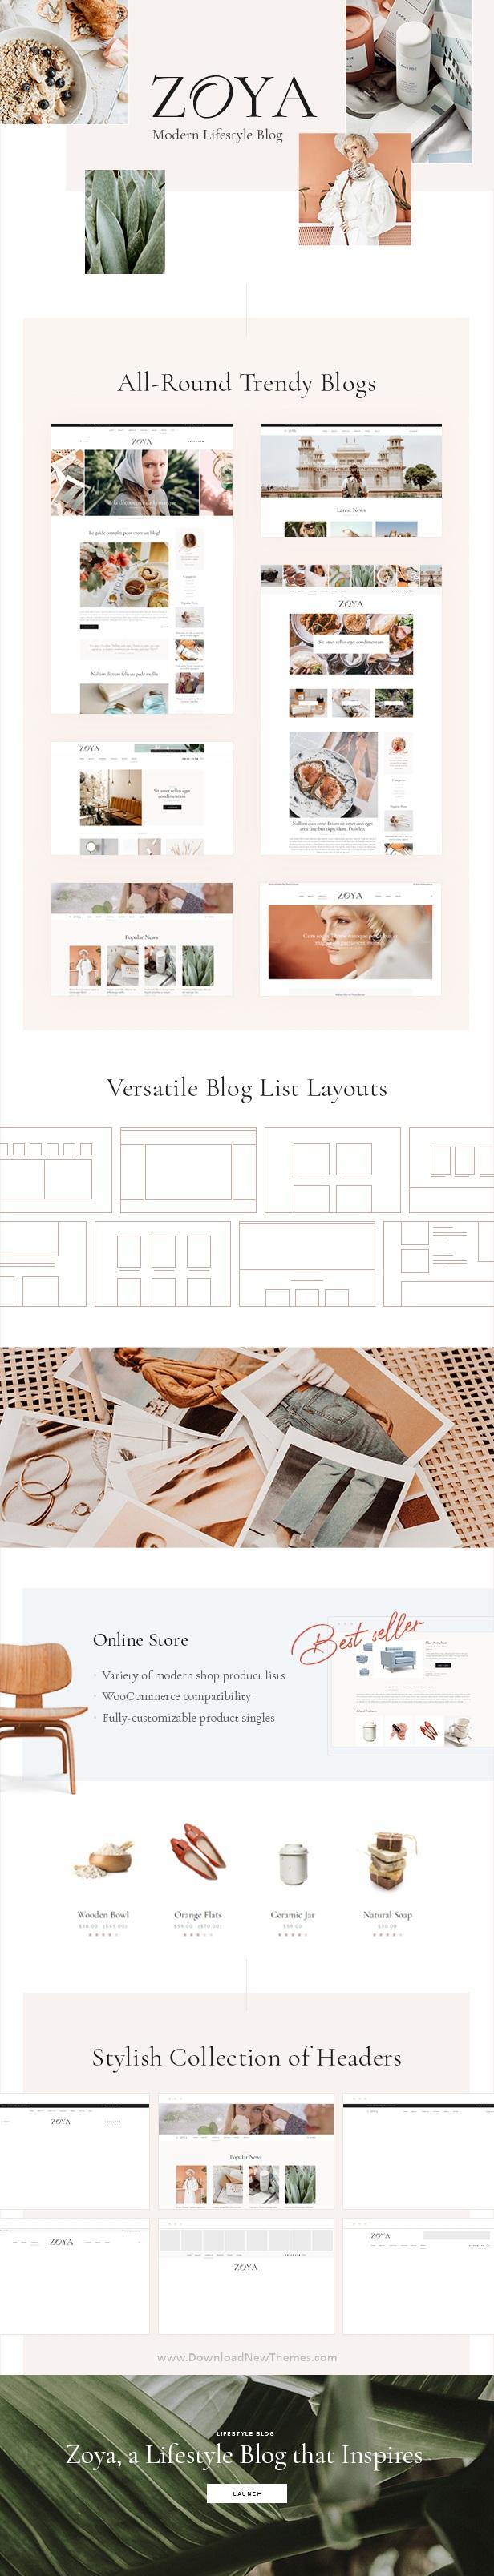 Zoya - Lifestyle Blog Premium WordPress Theme